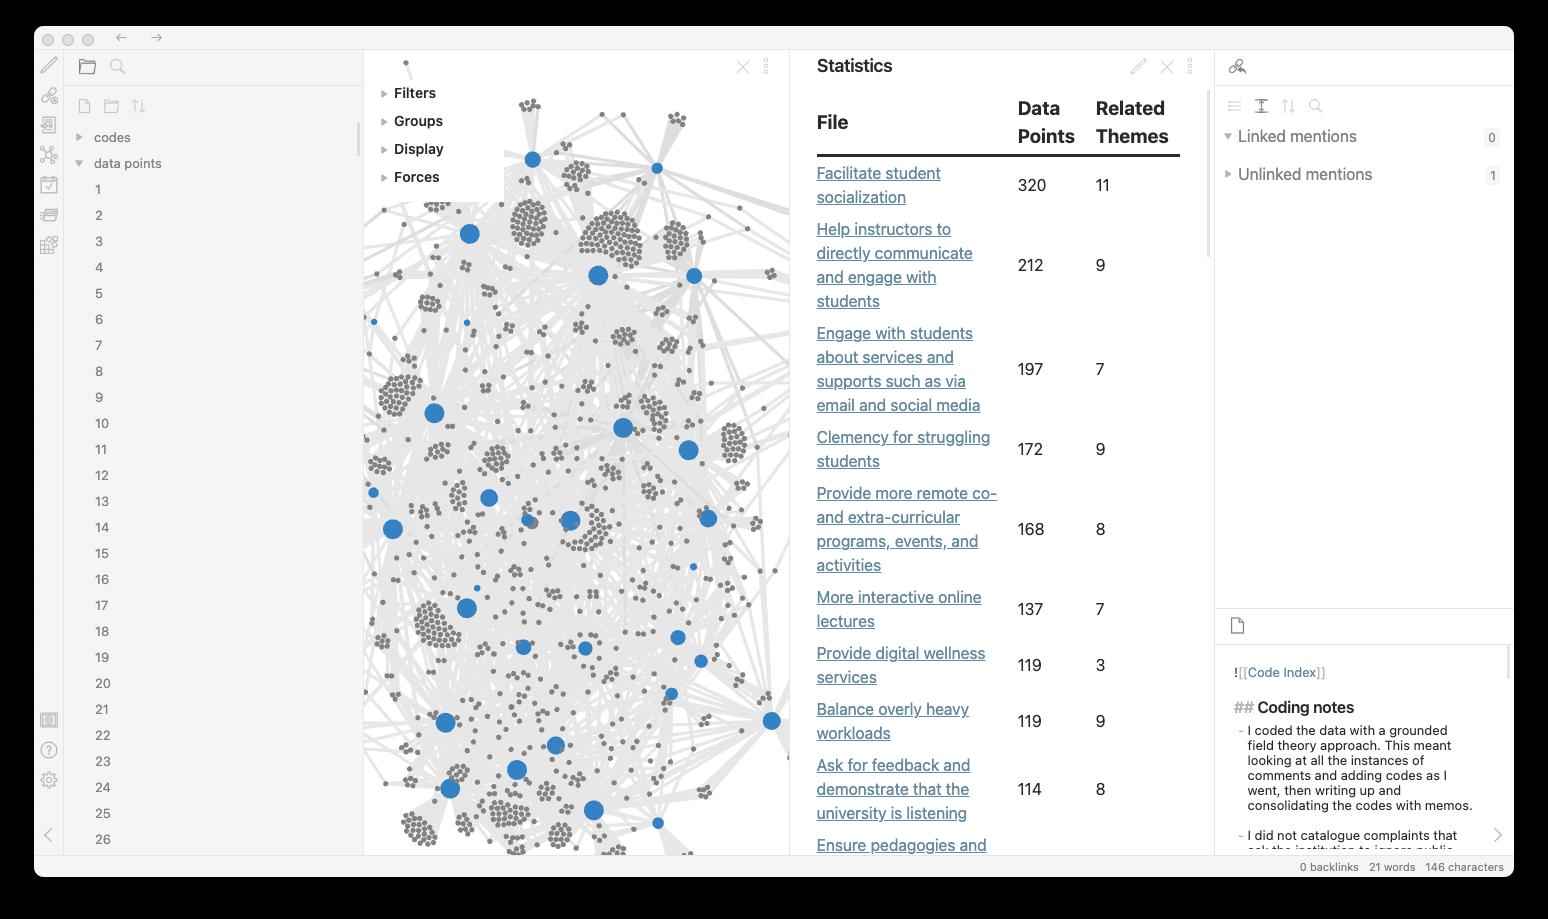 Qualitative data analysis using Obsidian